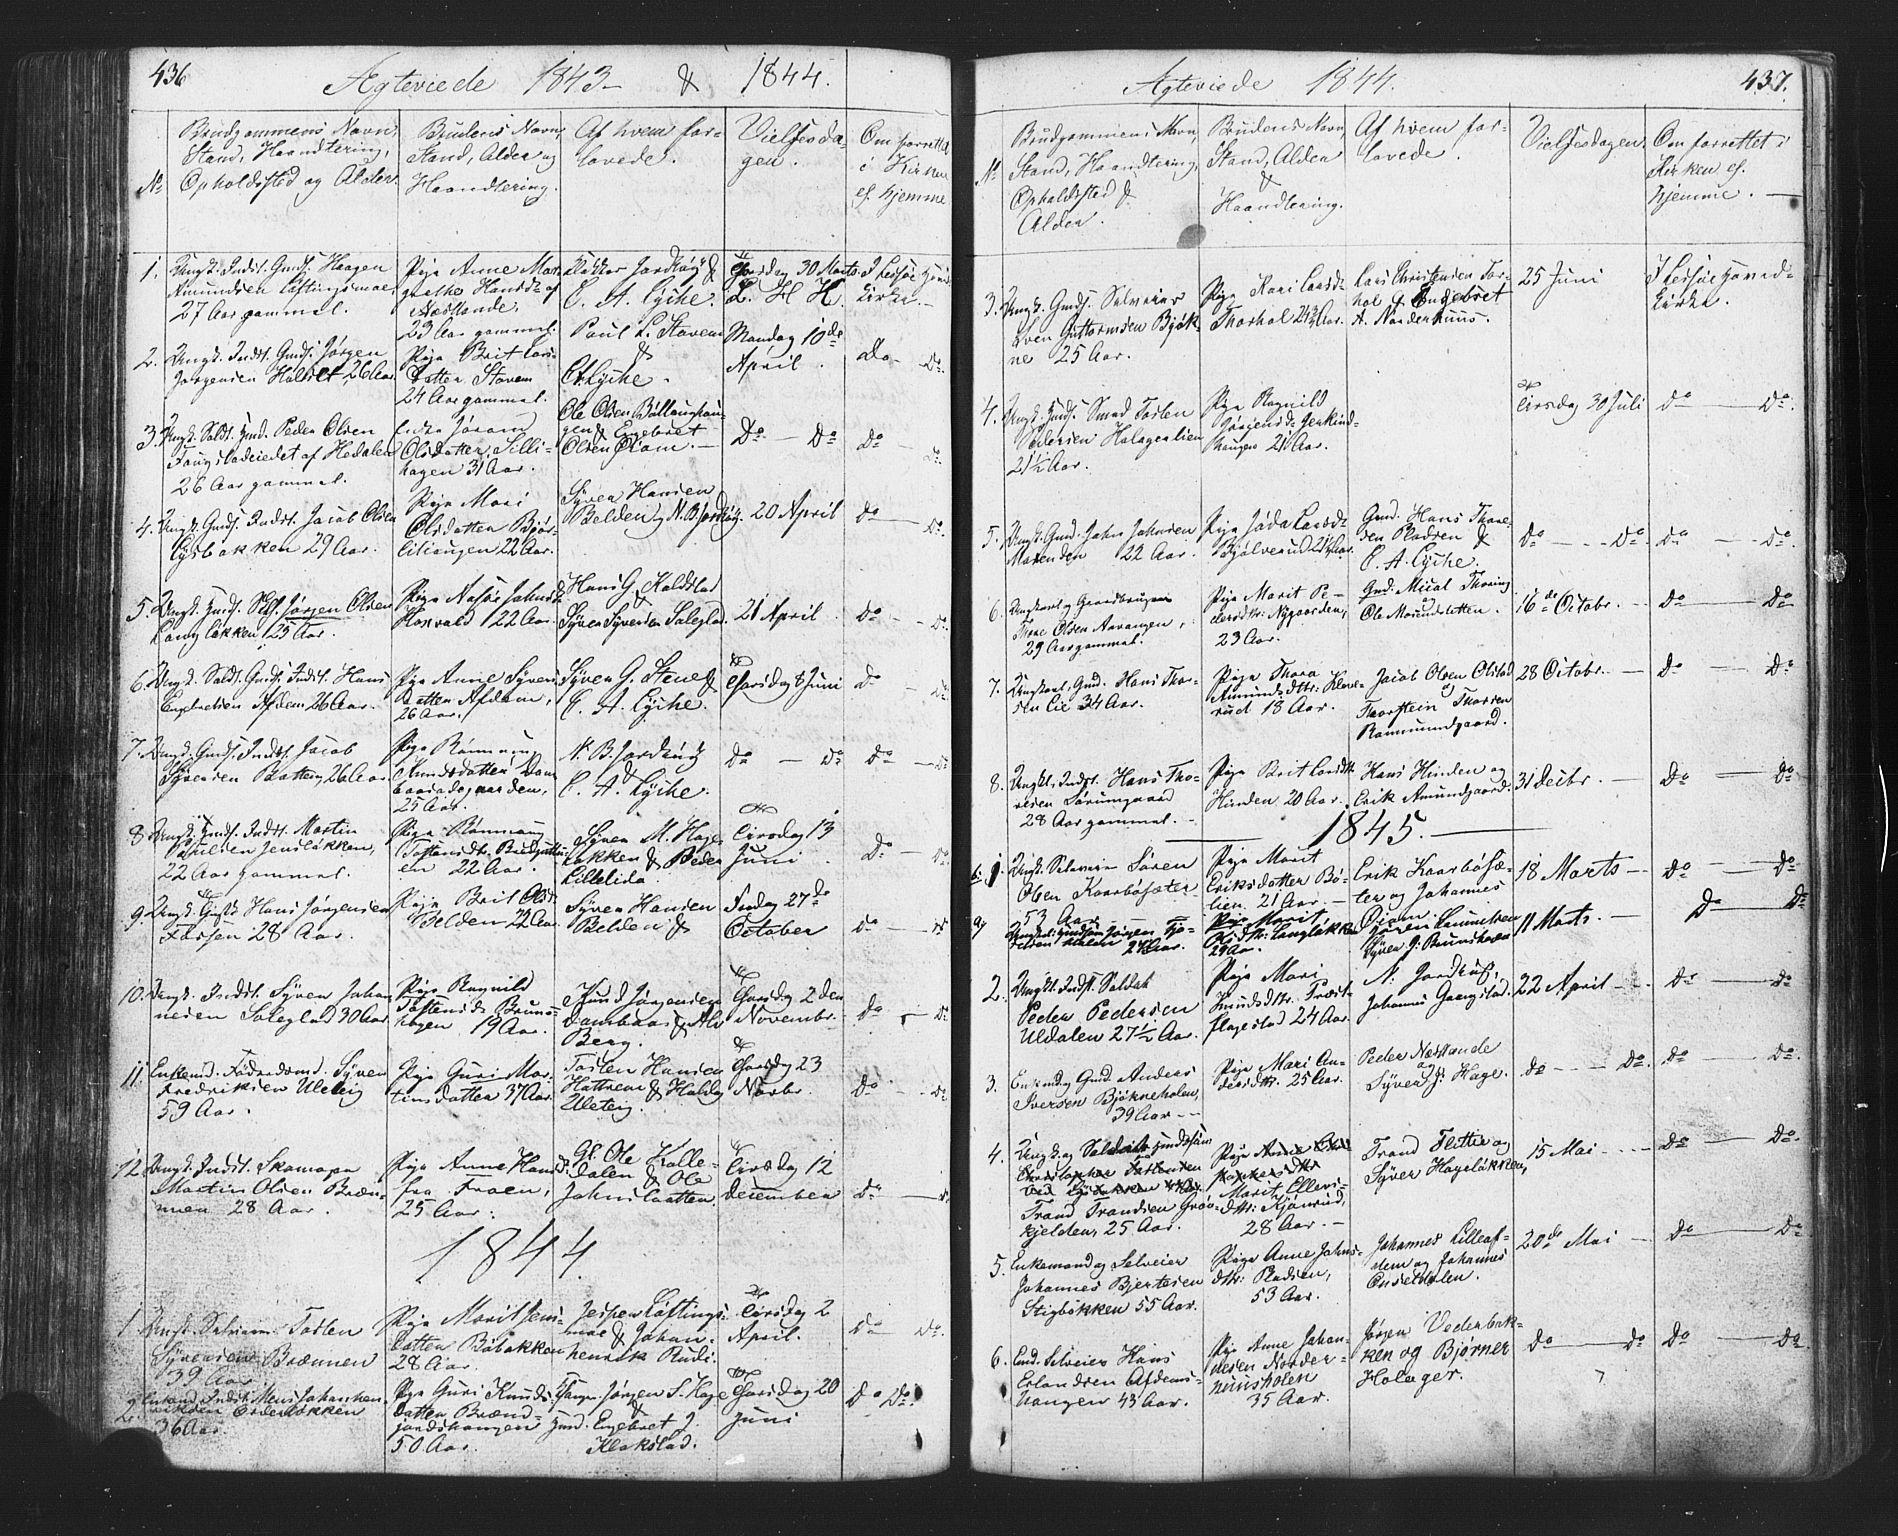 SAH, Lesja prestekontor, Klokkerbok nr. 2, 1832-1850, s. 436-437